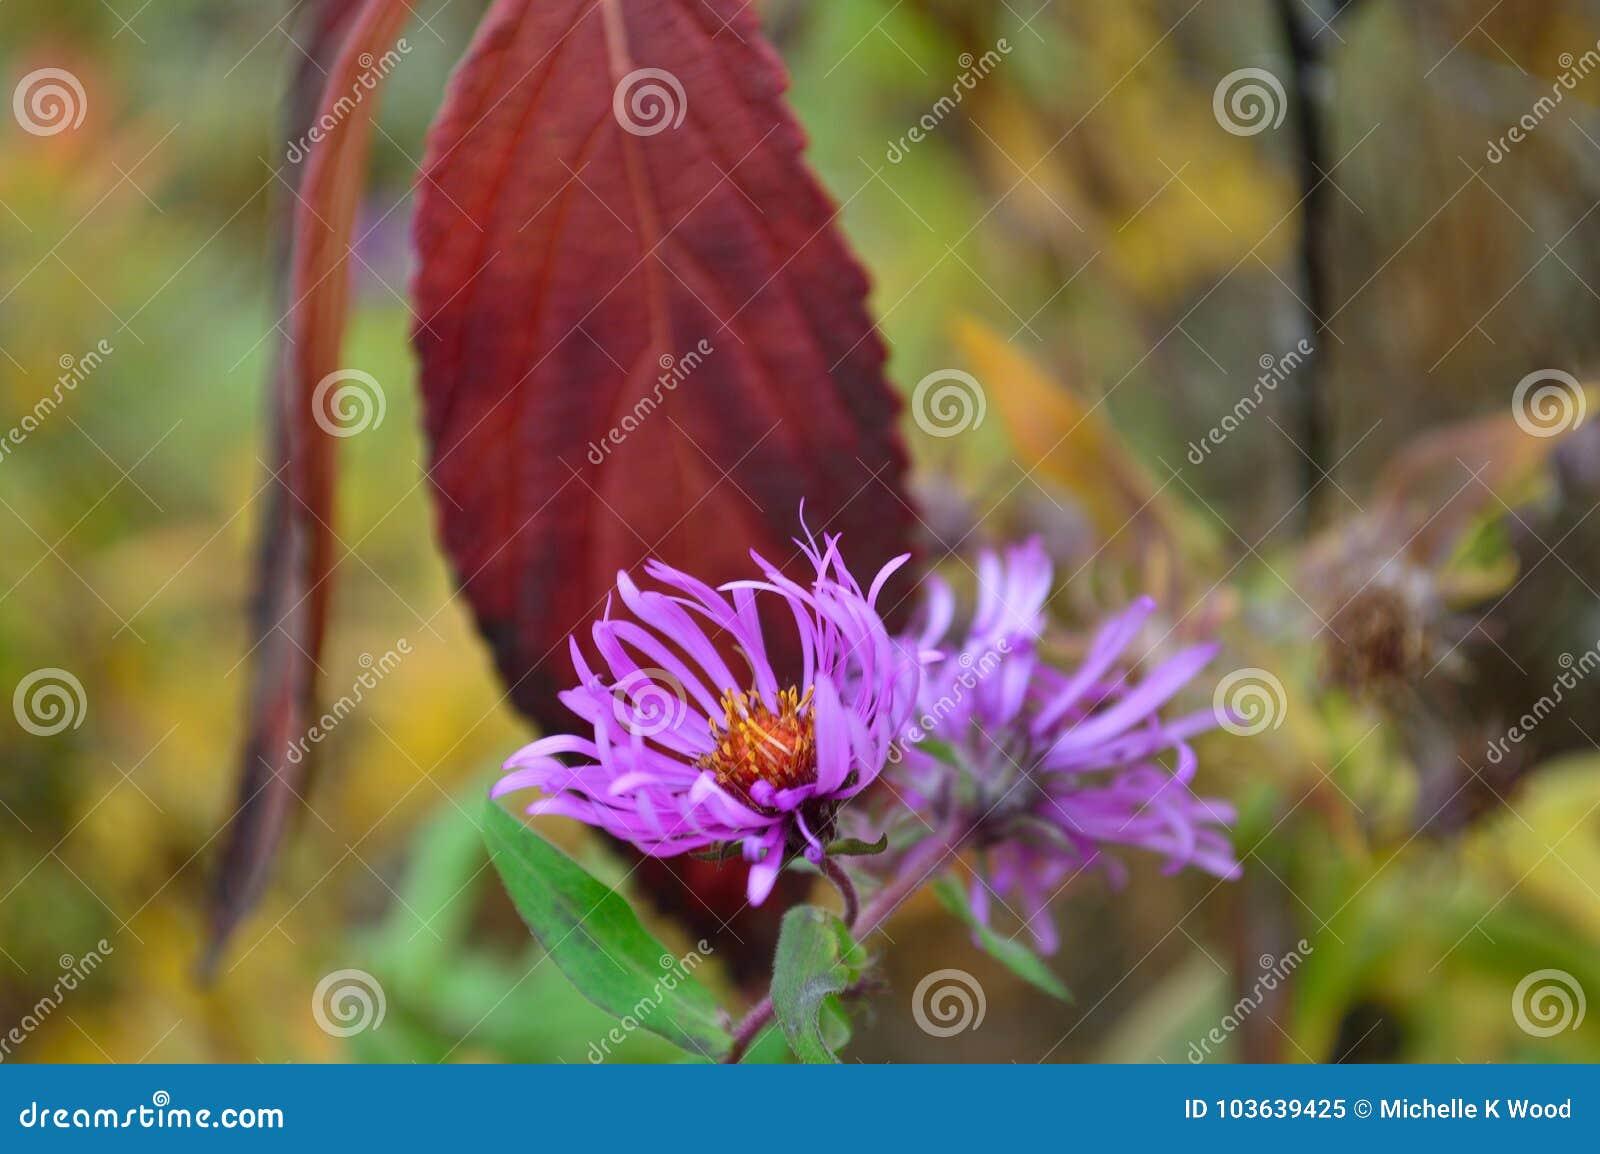 Thick stem purple aster flowers